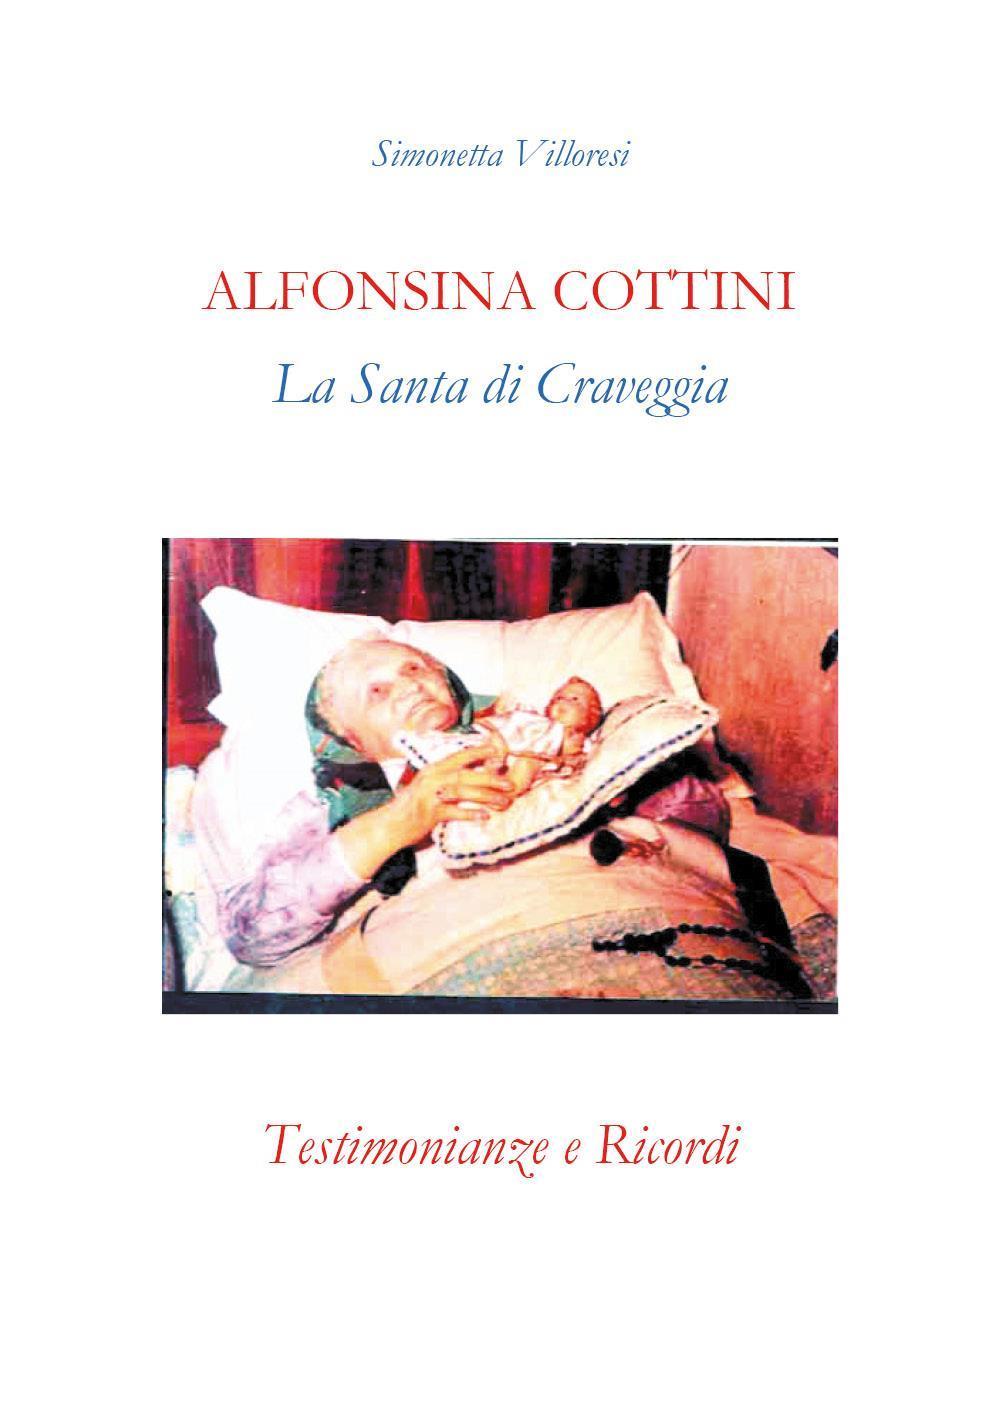 Alfonsina Cottini